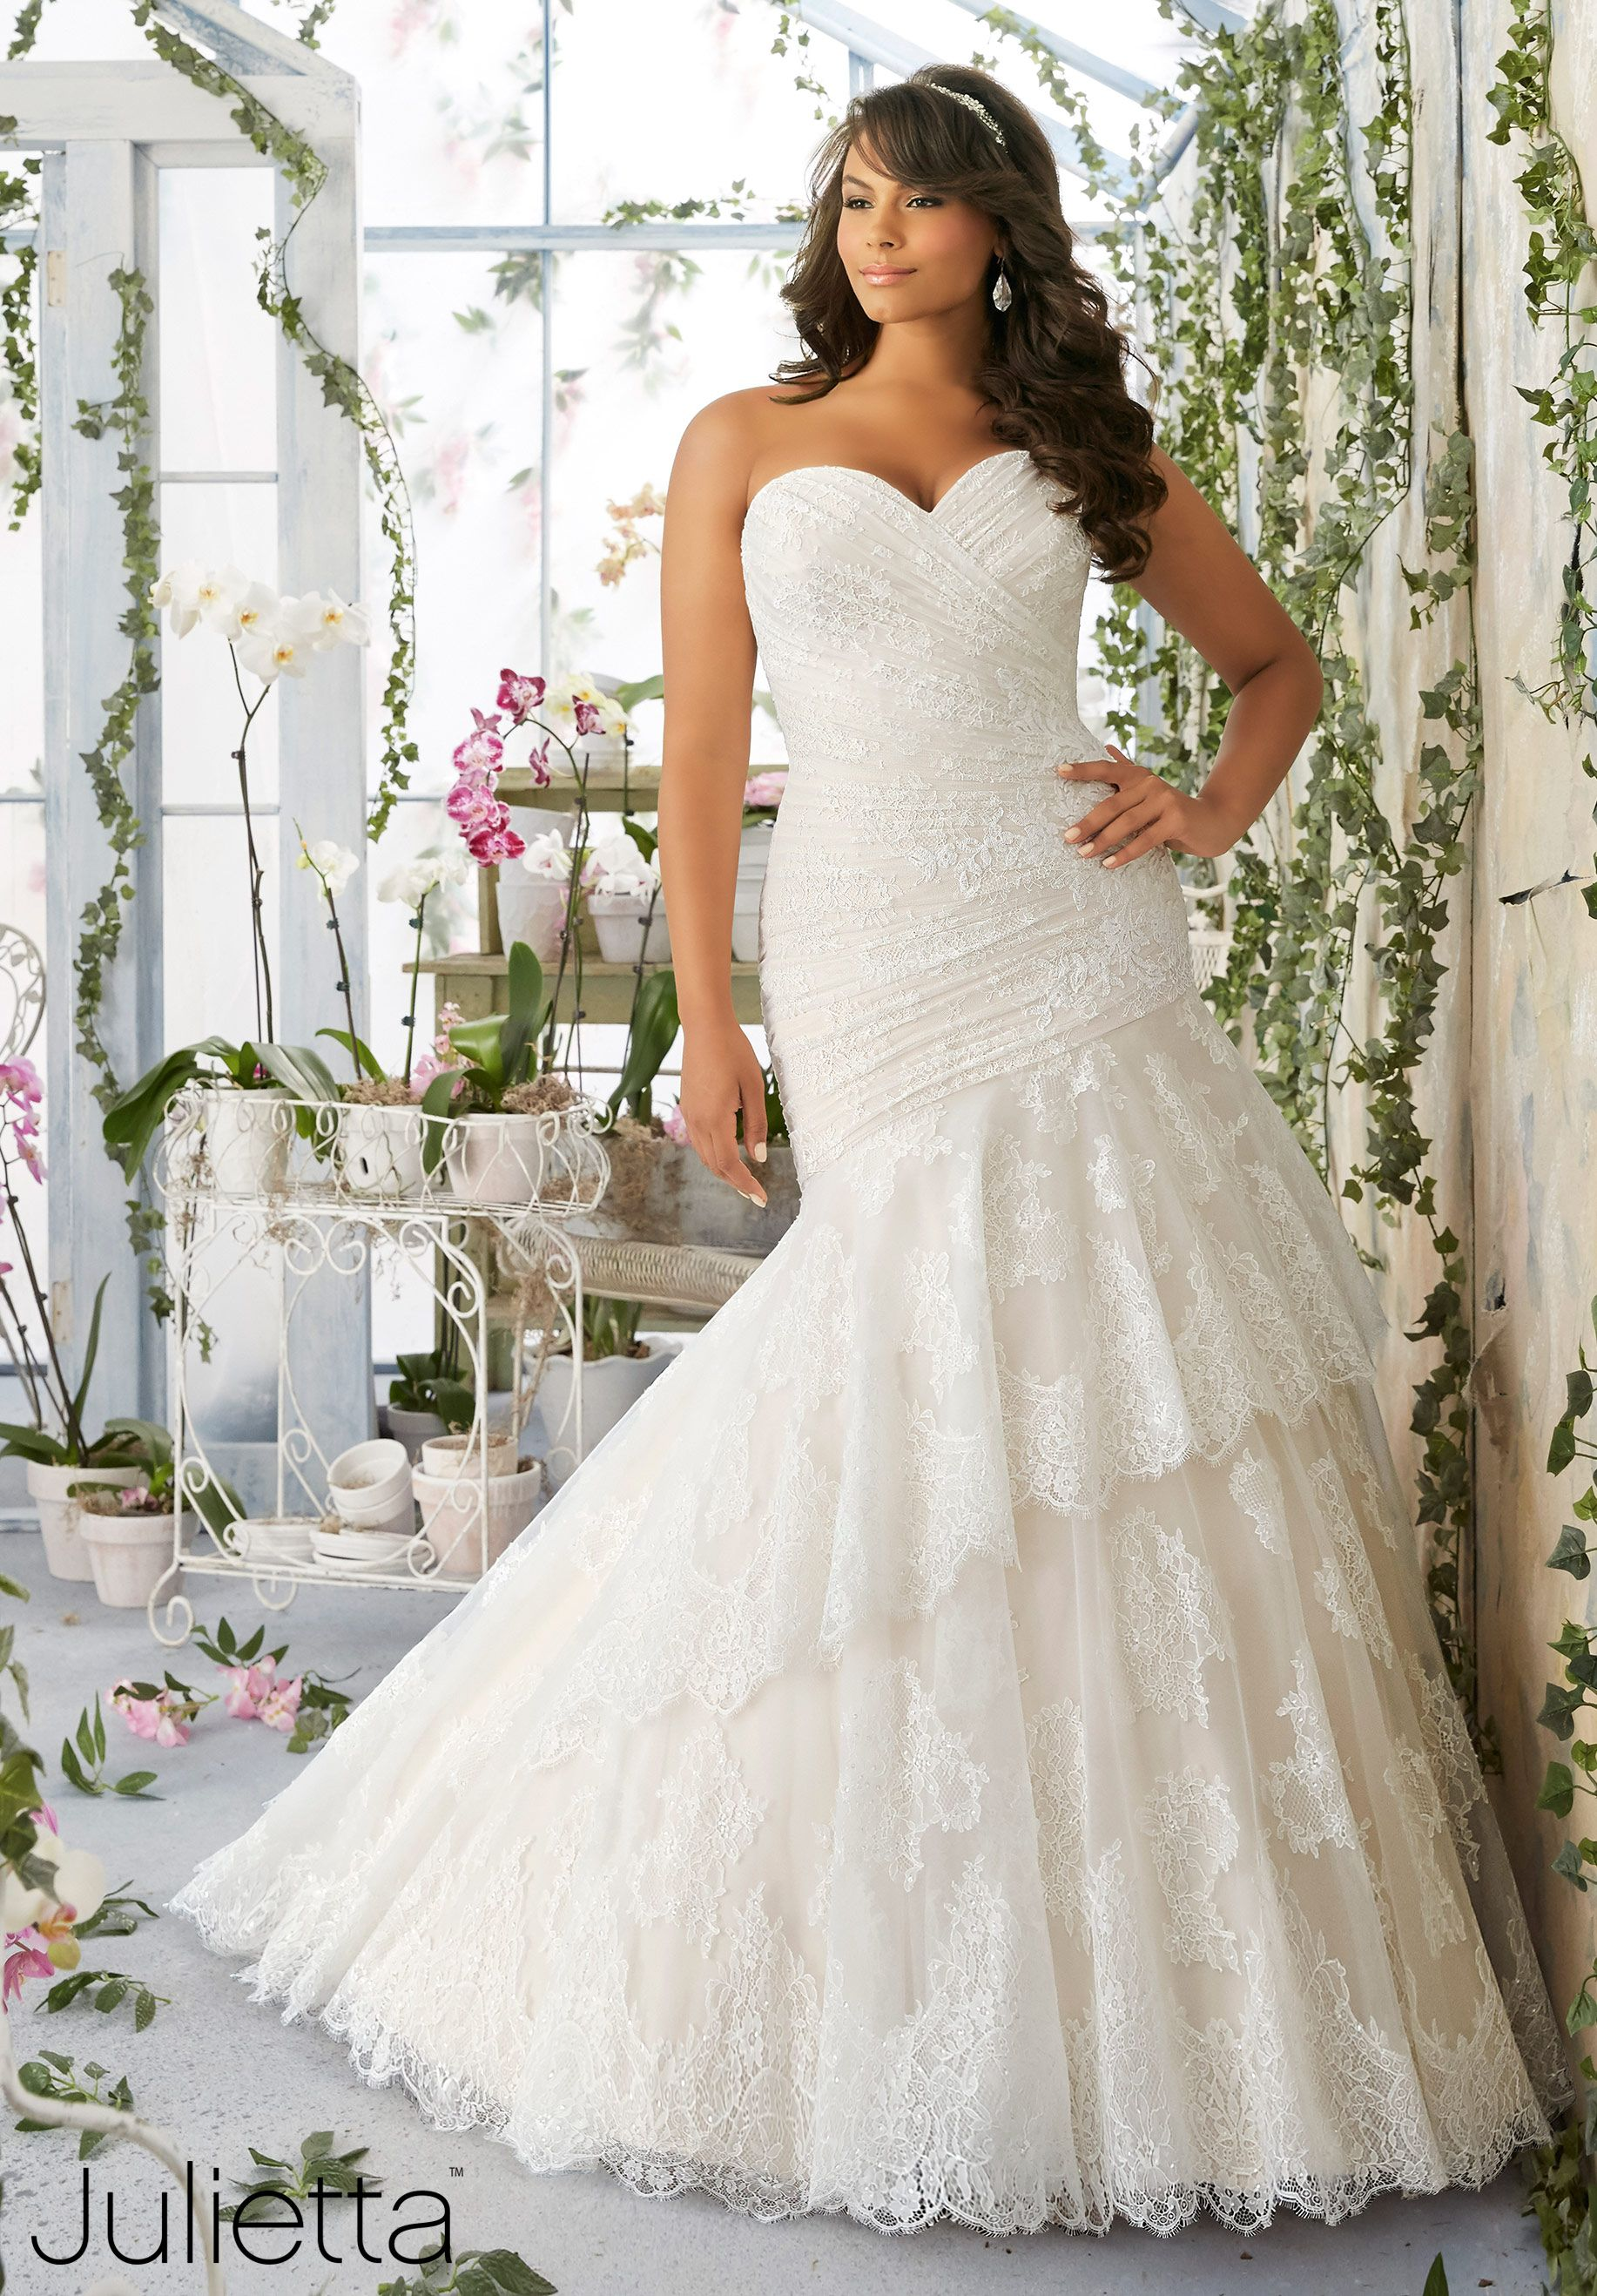 Plus size bridal gowns hochzeitskleid pinterest mori lee plus size bridal gowns ombrellifo Image collections